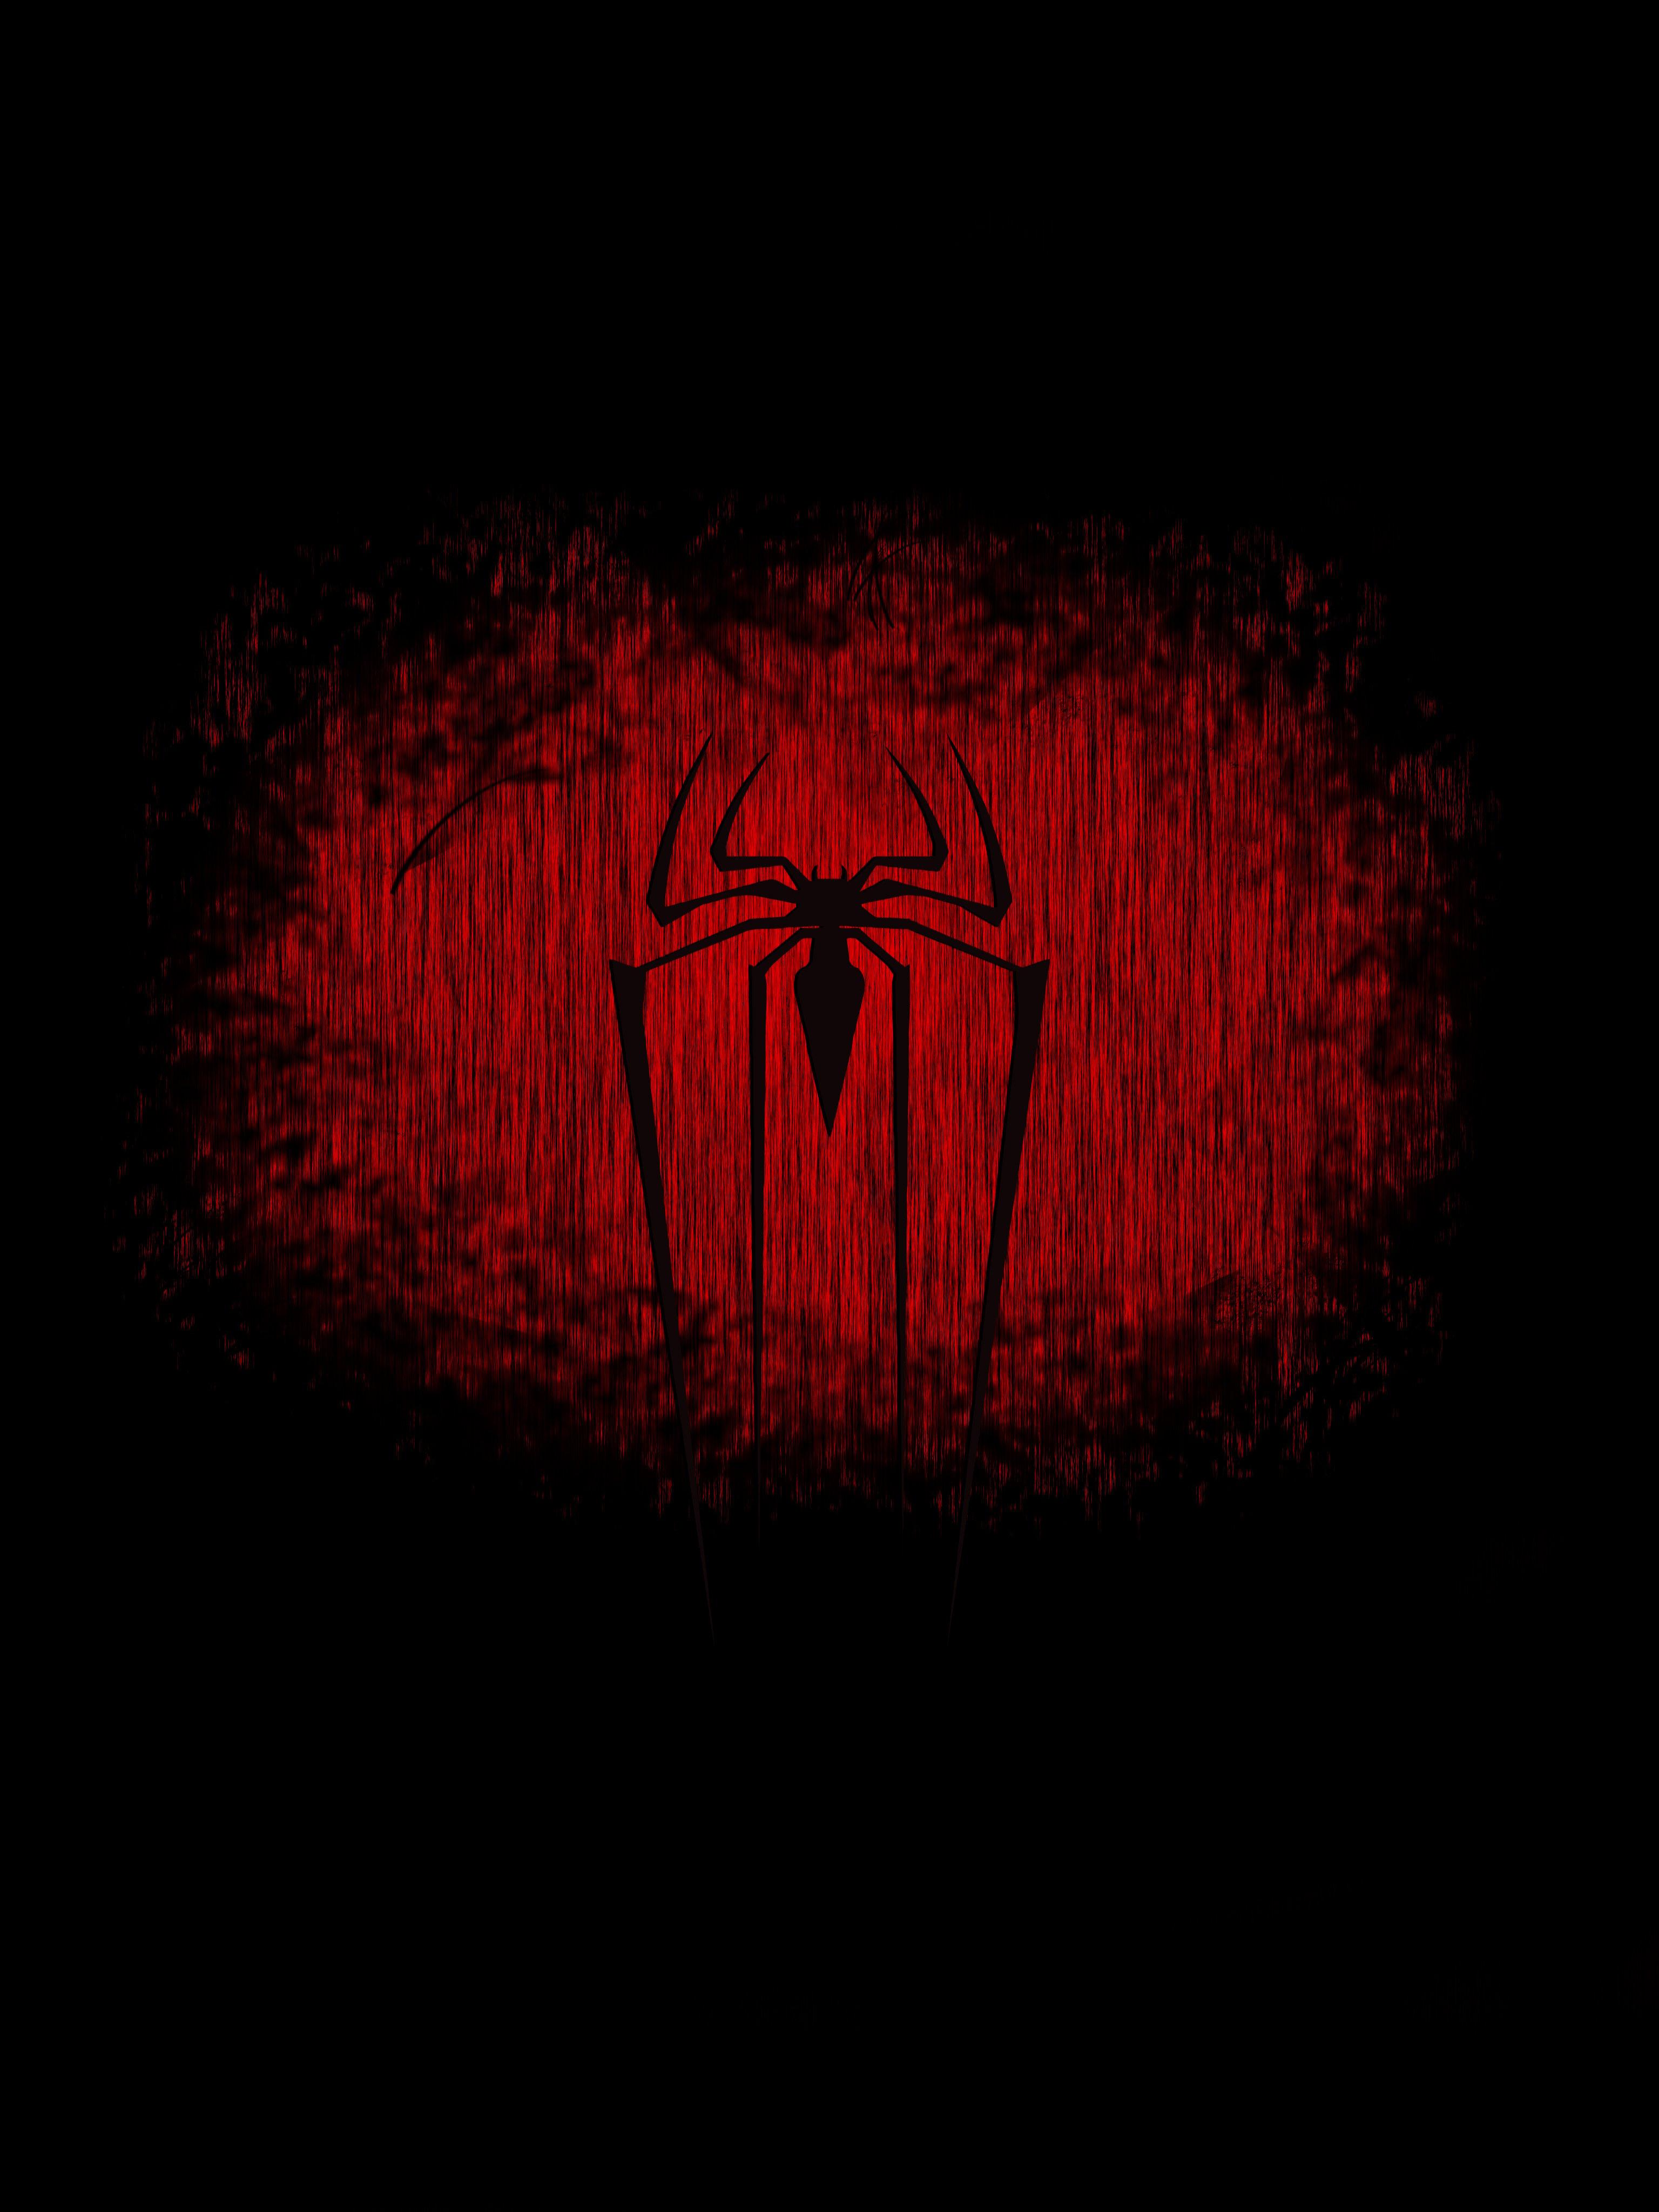 Free Download Spiderman Hd Wallpaper By Shikharsrivastava